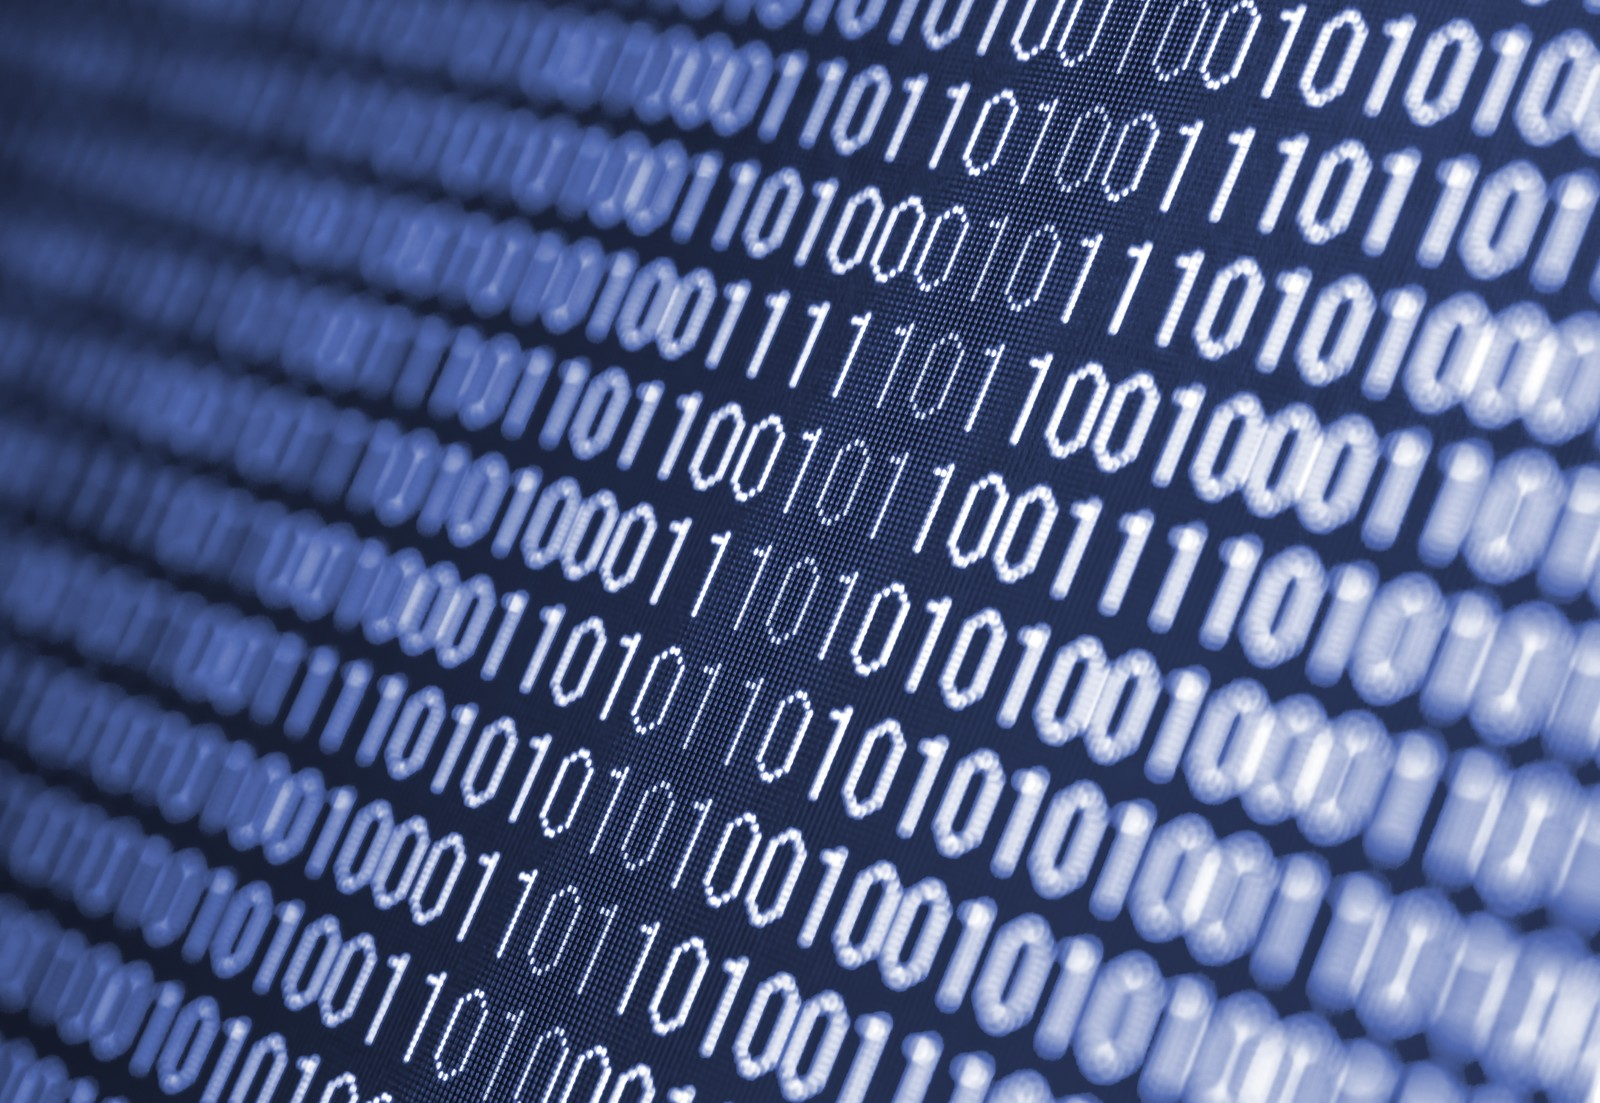 【Rコード】多変量正規分布のデータ発生【パッケージなし】